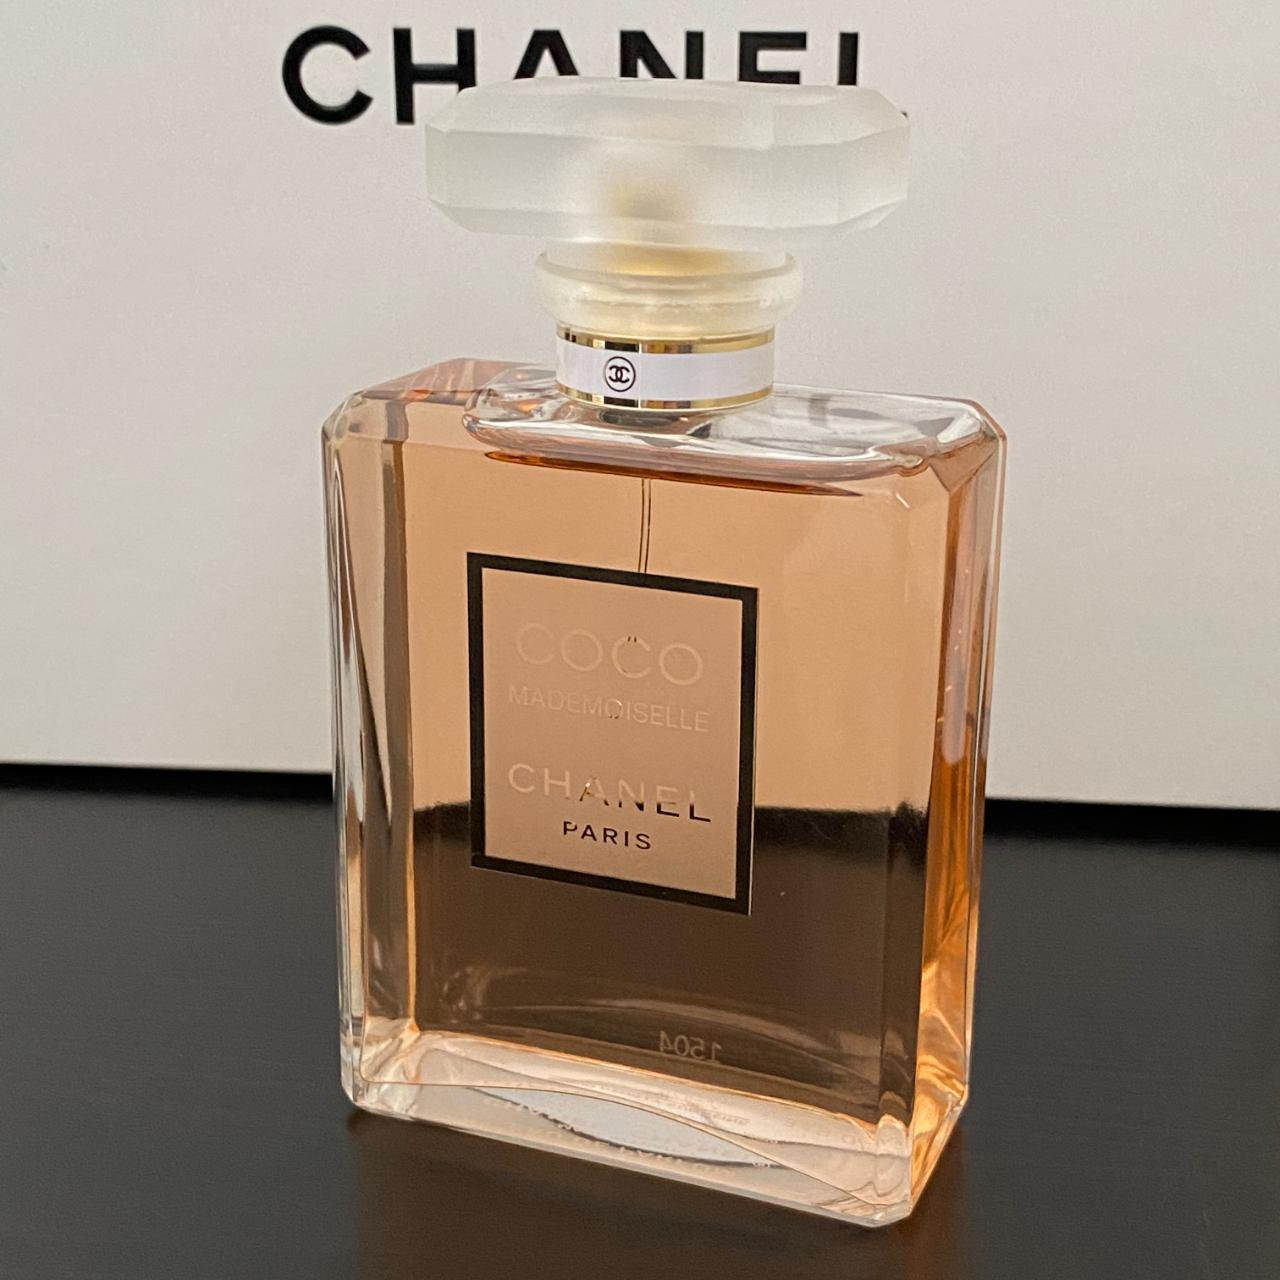 Product Image 1 - Chanel Coco Mademoiselle Eau de